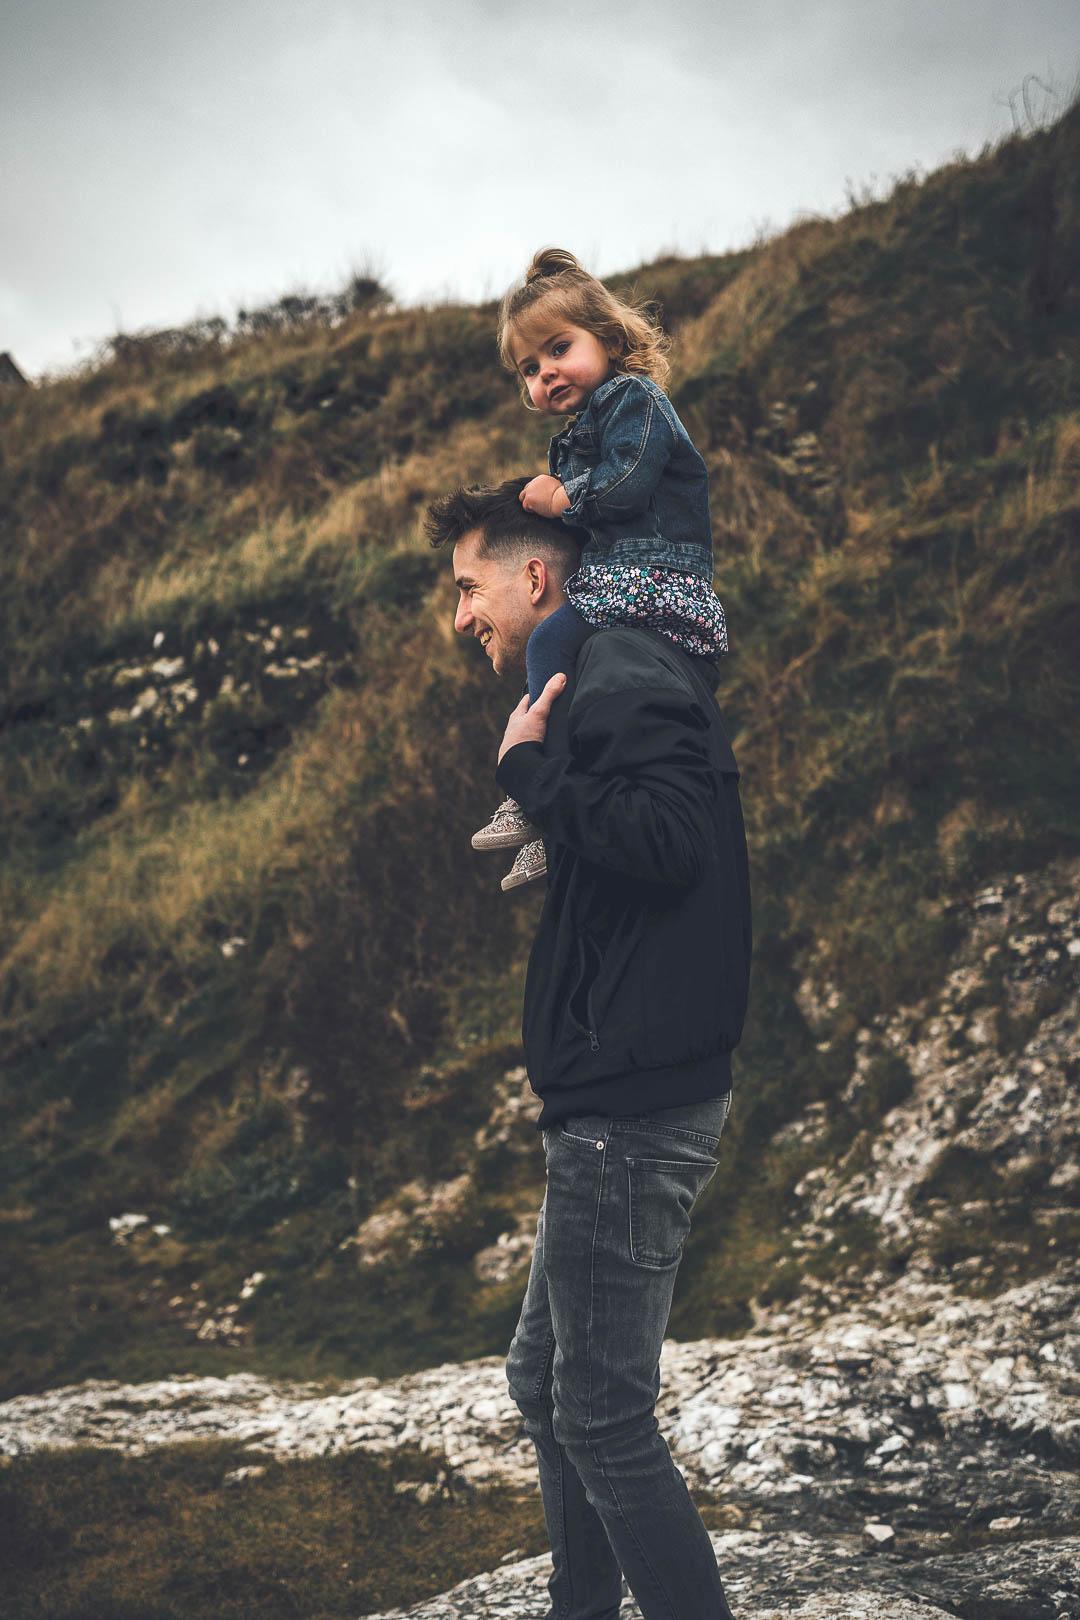 Northern Ireland Family Photographer-5.jpg